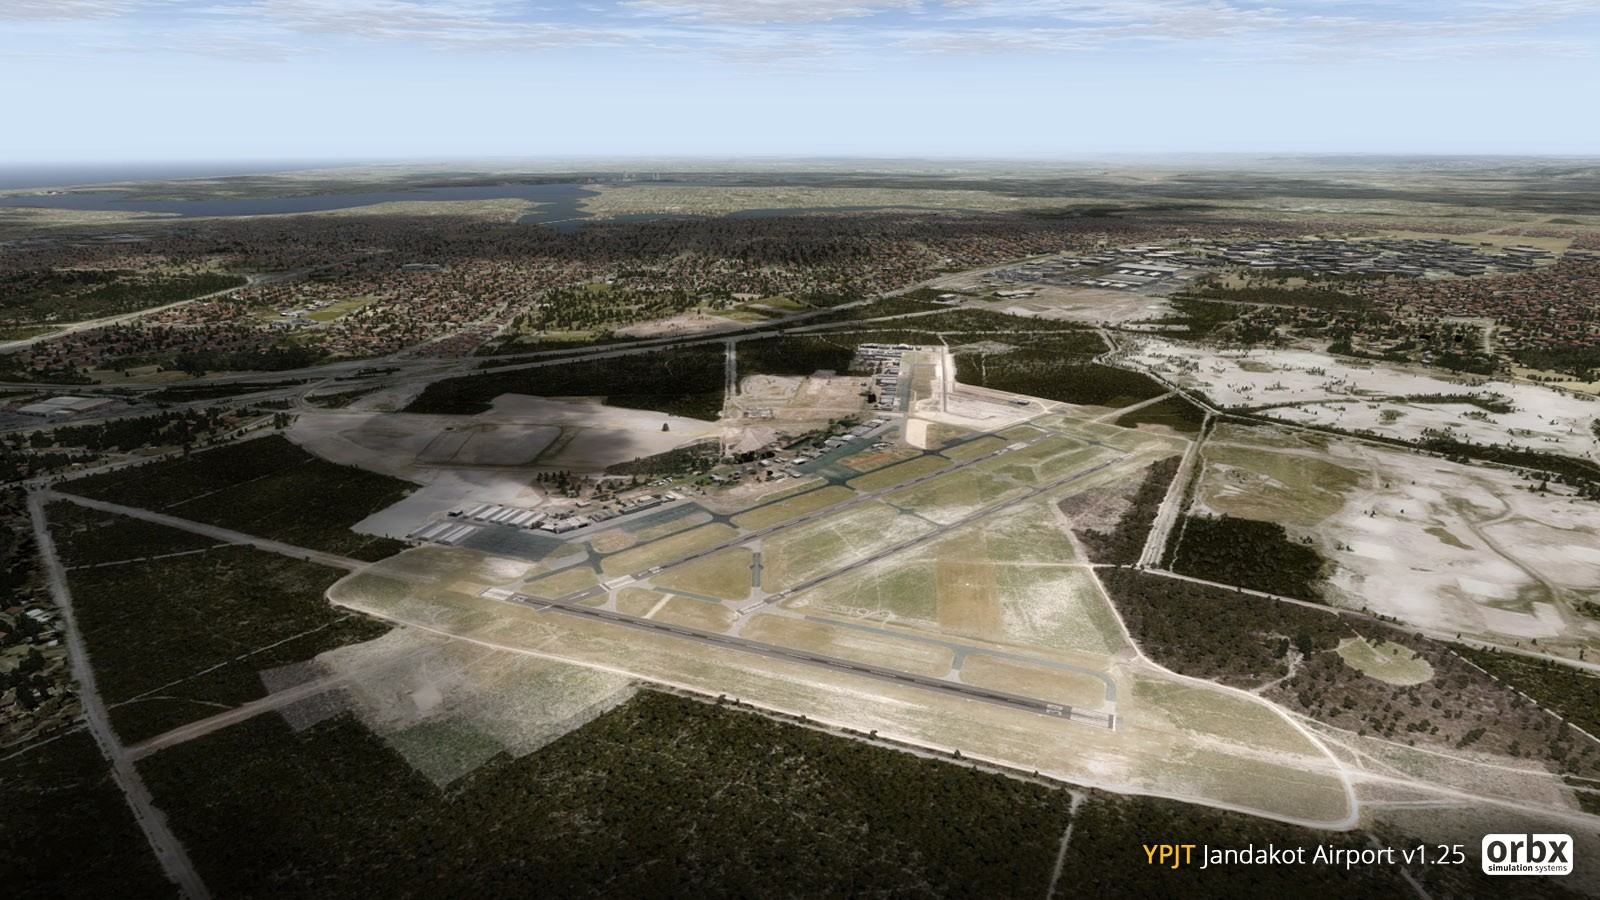 YPJT Perth Jandakot Airport